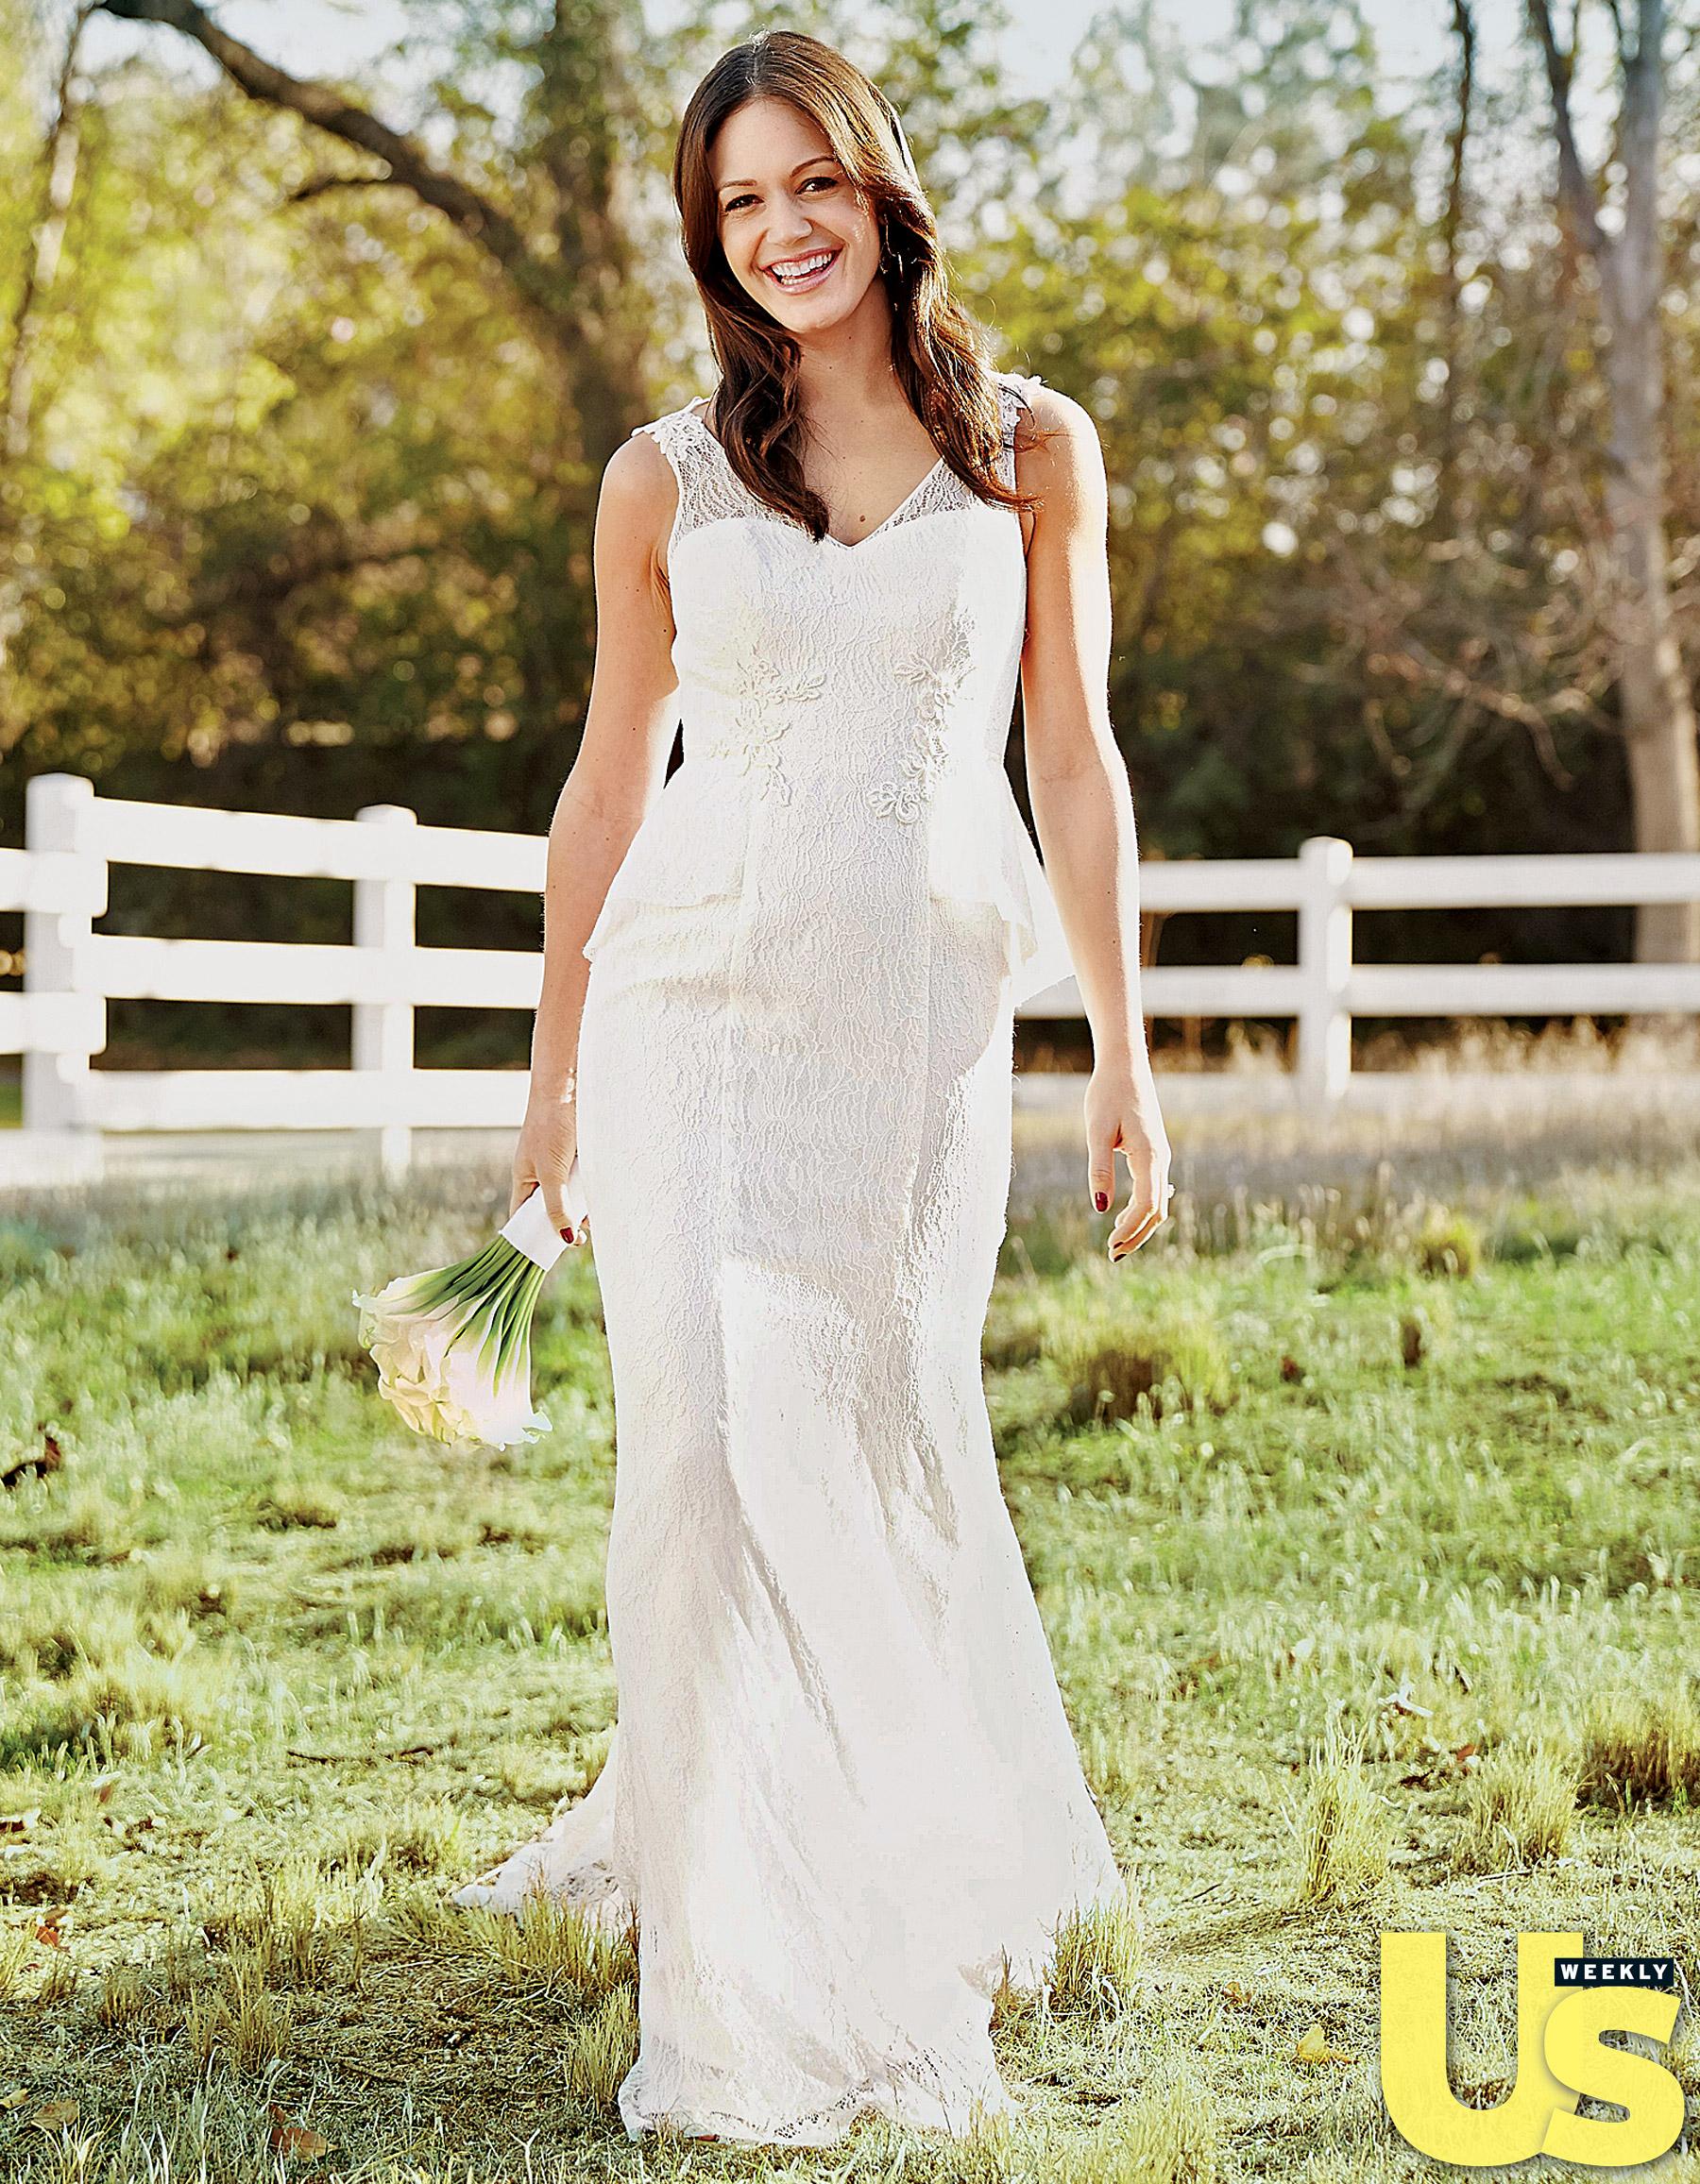 Desiree Hartsock in a wedding dress